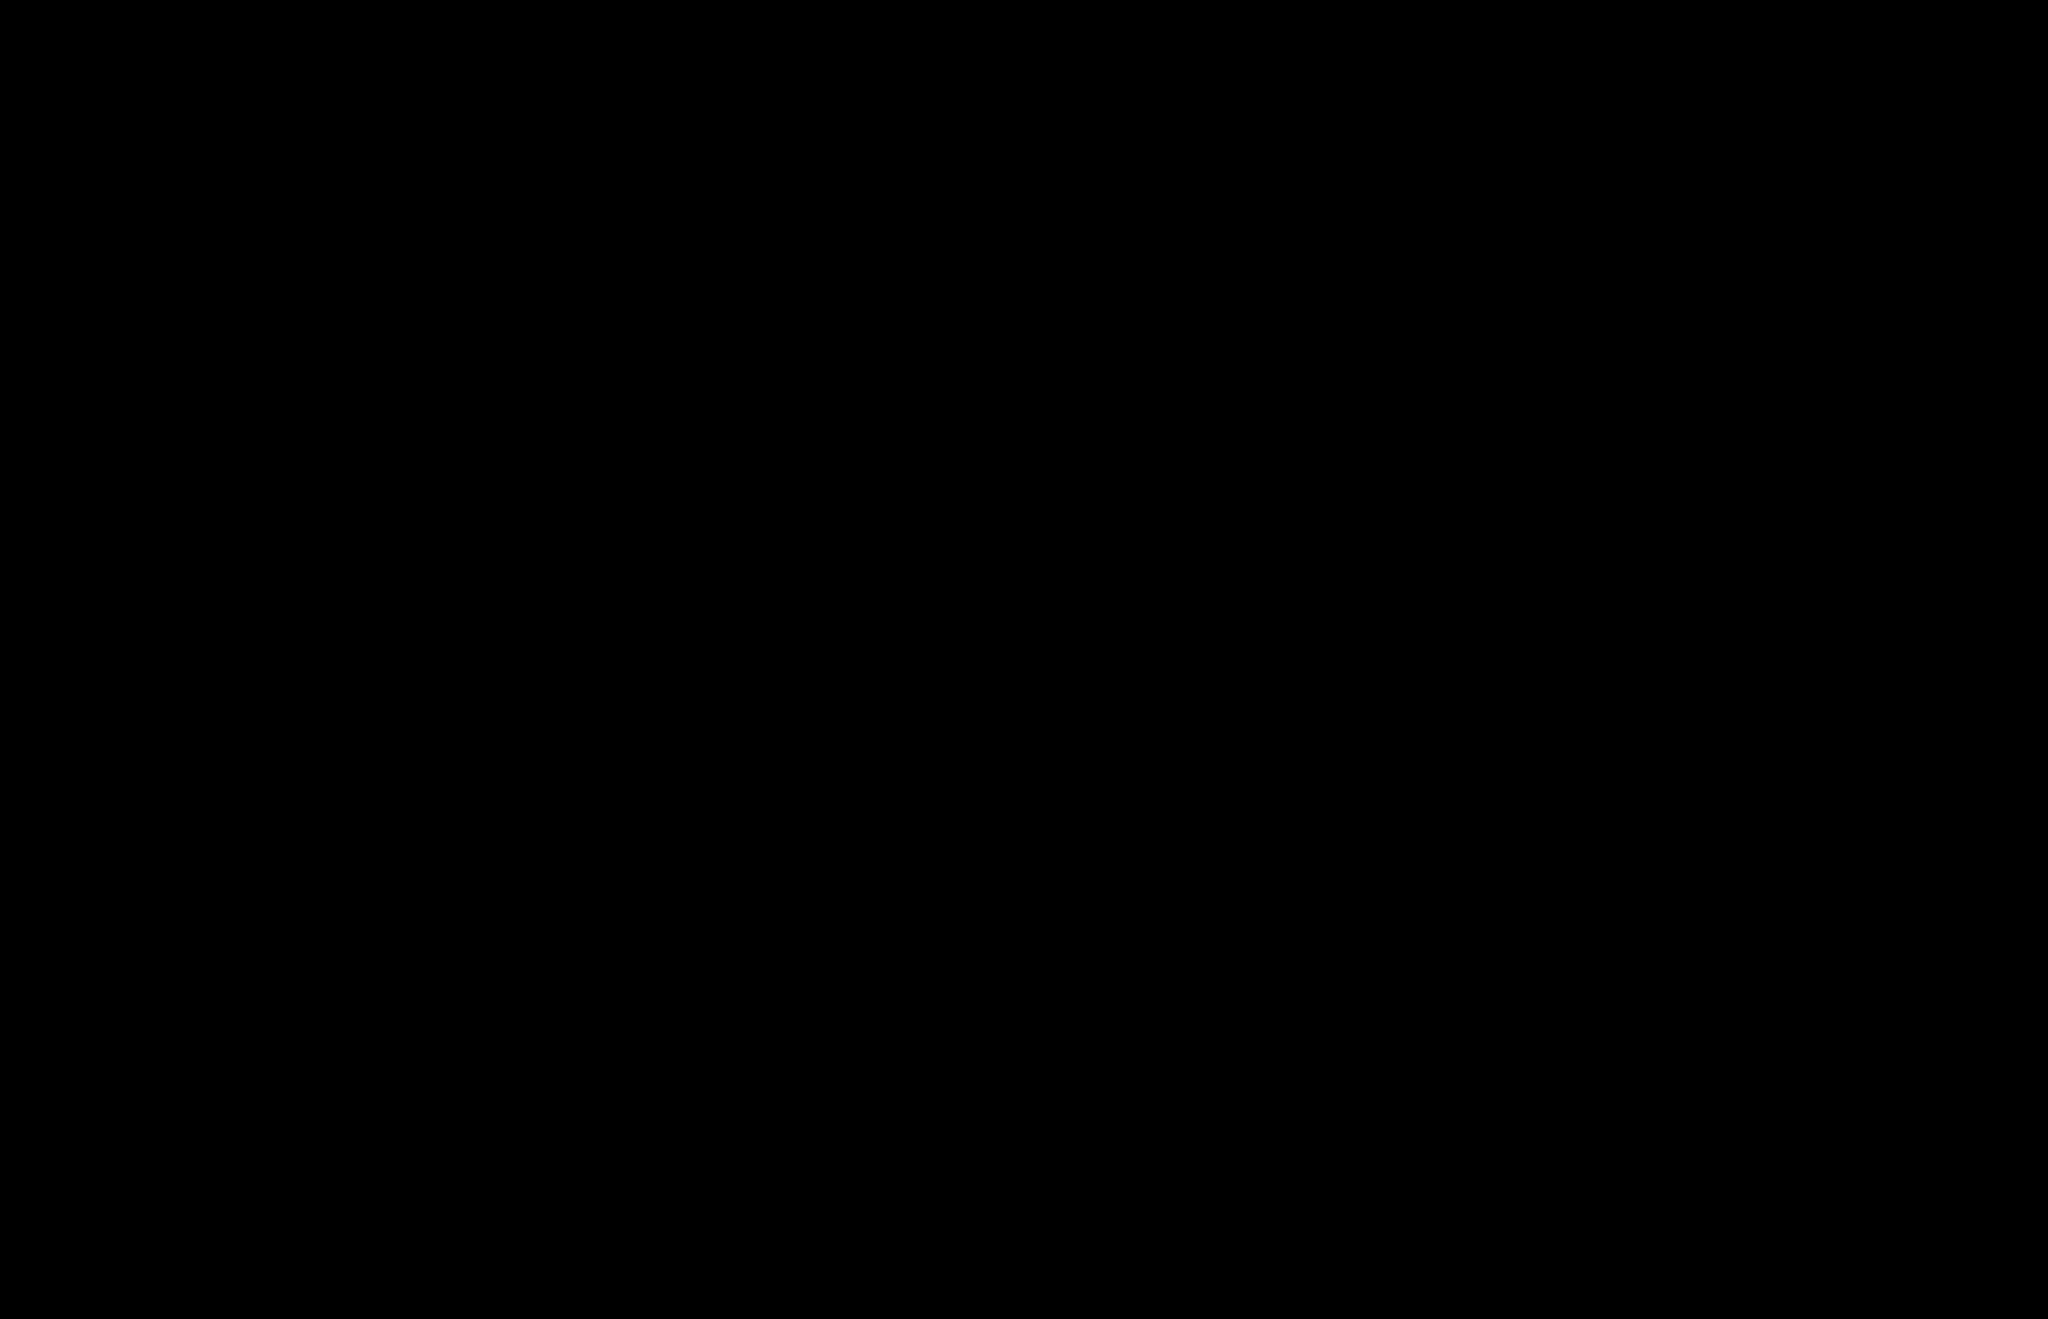 Vertical Lift Amp Drop Doors